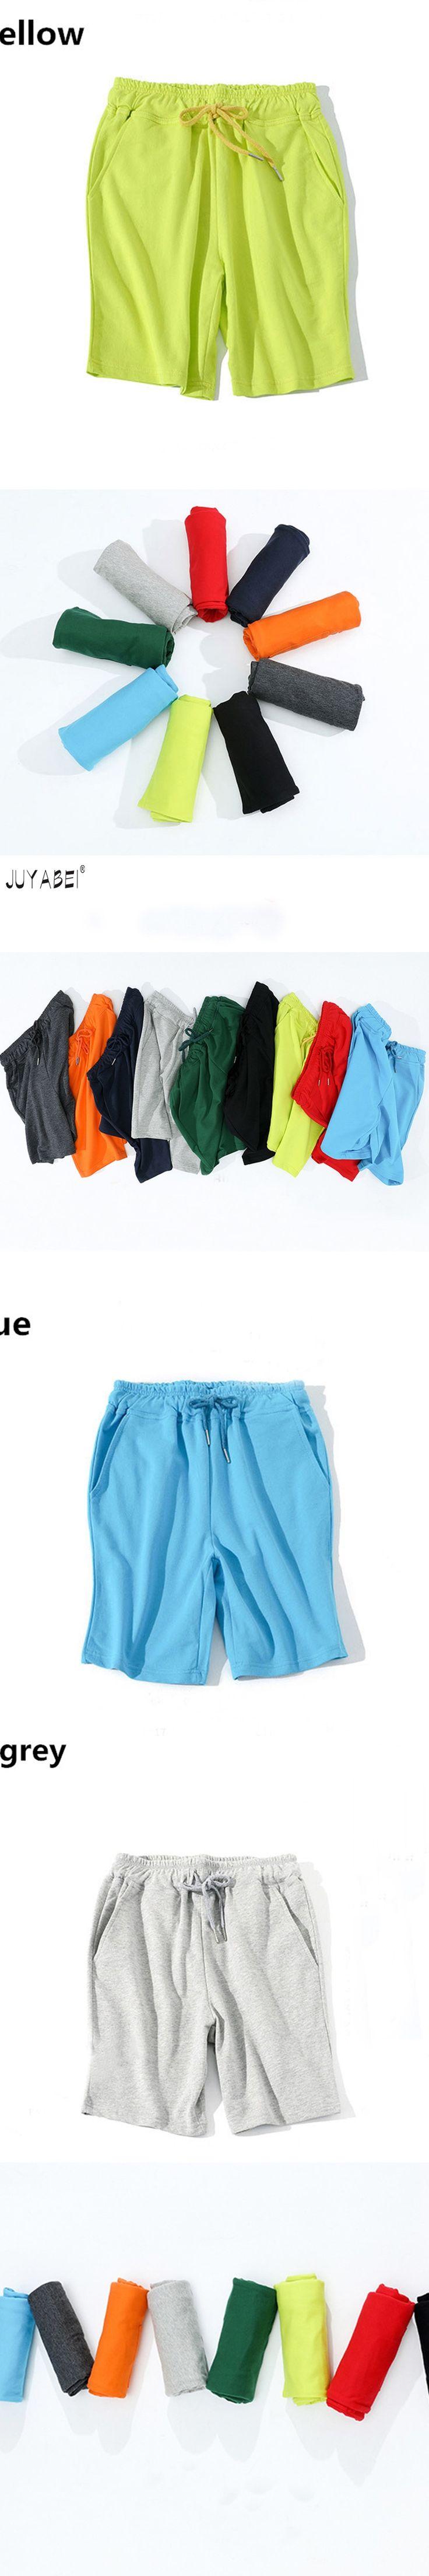 2017 Brand Men Shorts Loose Short Trousers Casual Calf-Length Jogger Mens Shorts Sweatpants Fitness Man Workout Cotton Shorts